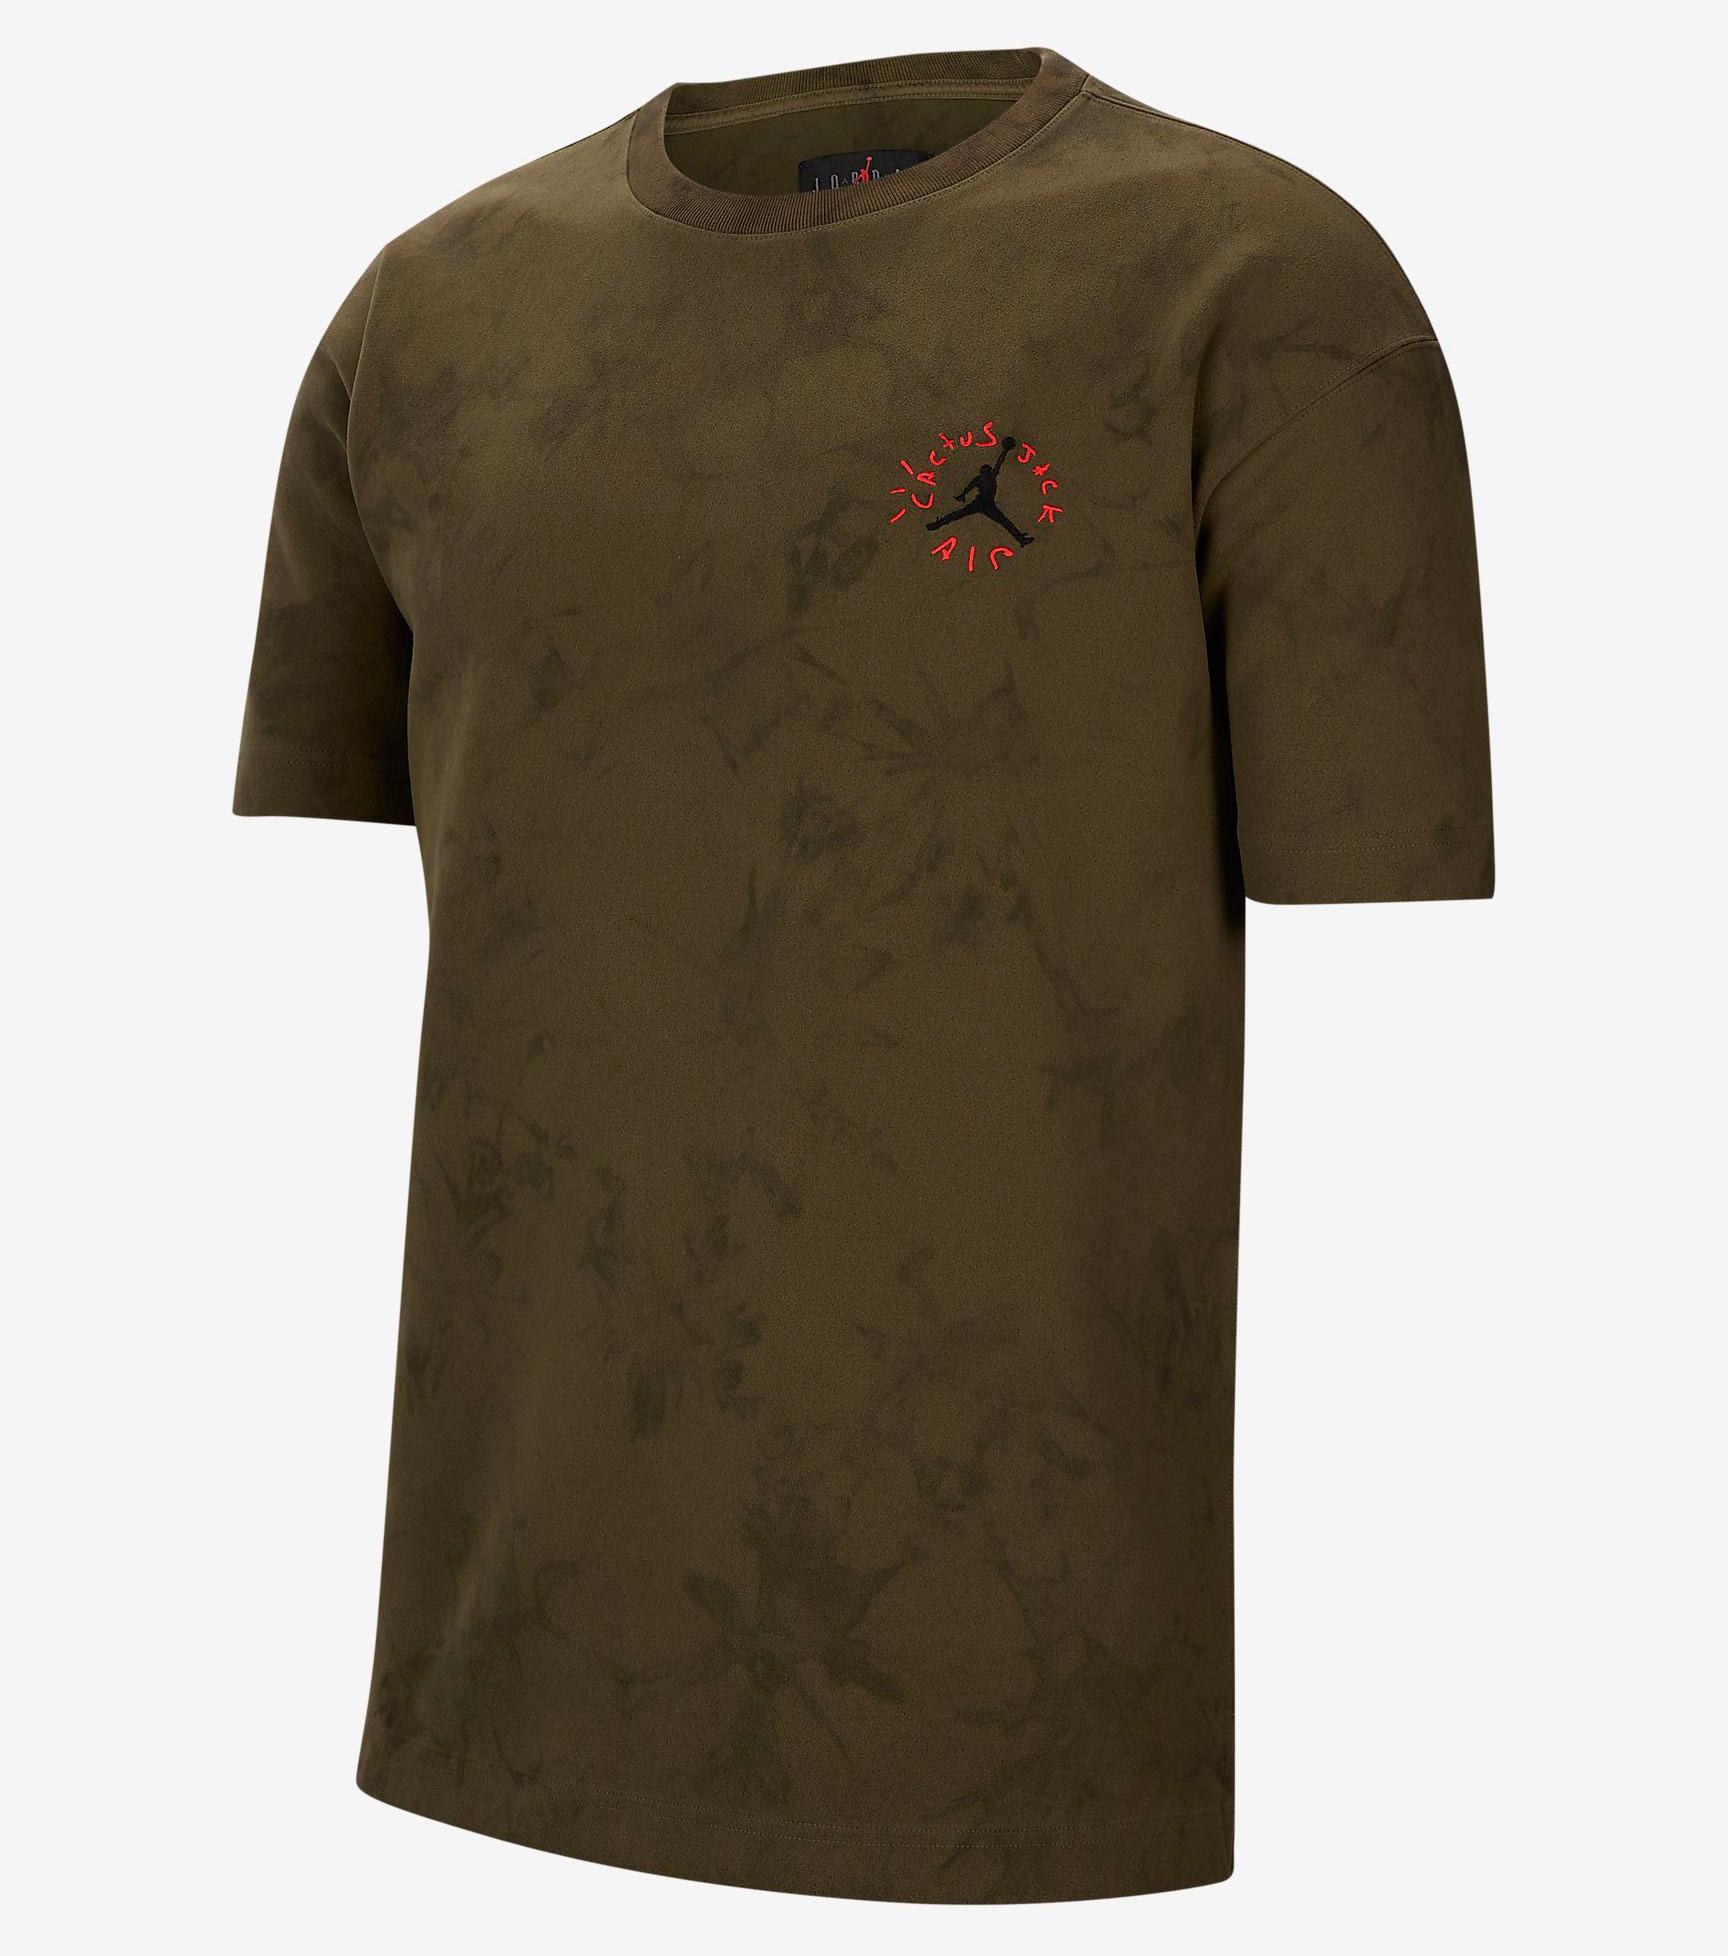 travis-scott-air-jordan-6-olive-shirt-2